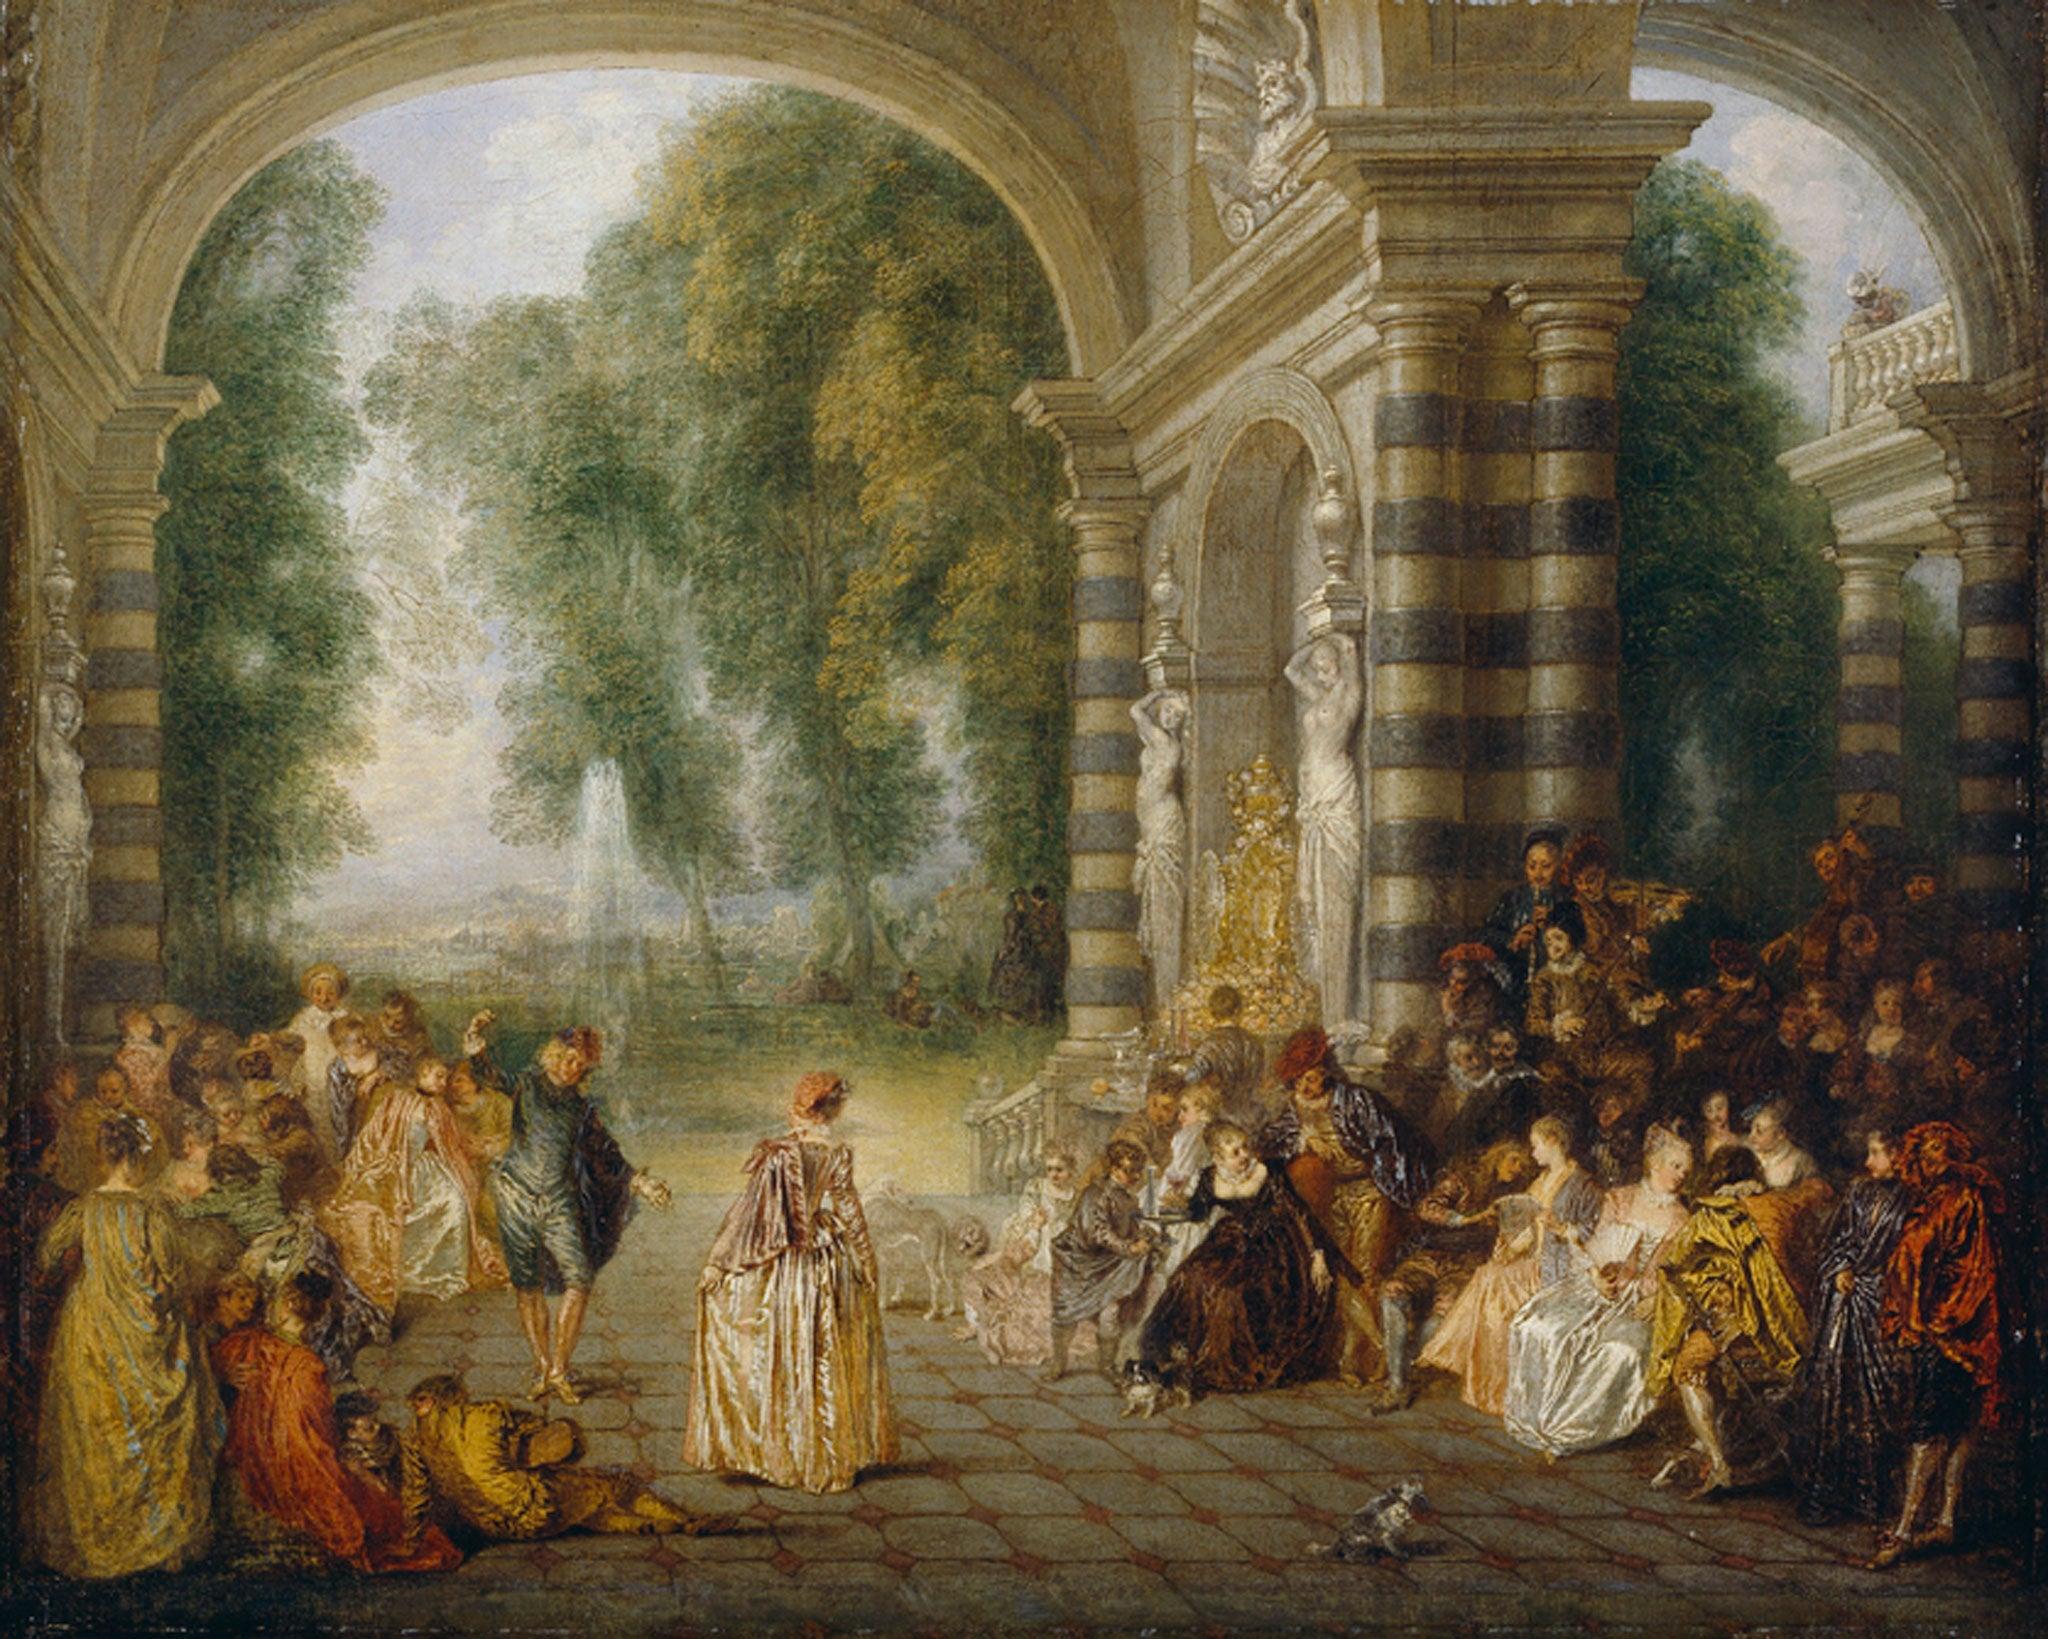 Great works: Les Plaisirs du Bal (The Pleasures of the Dance) c. 1715-17 by Jean-Antoine Watteau